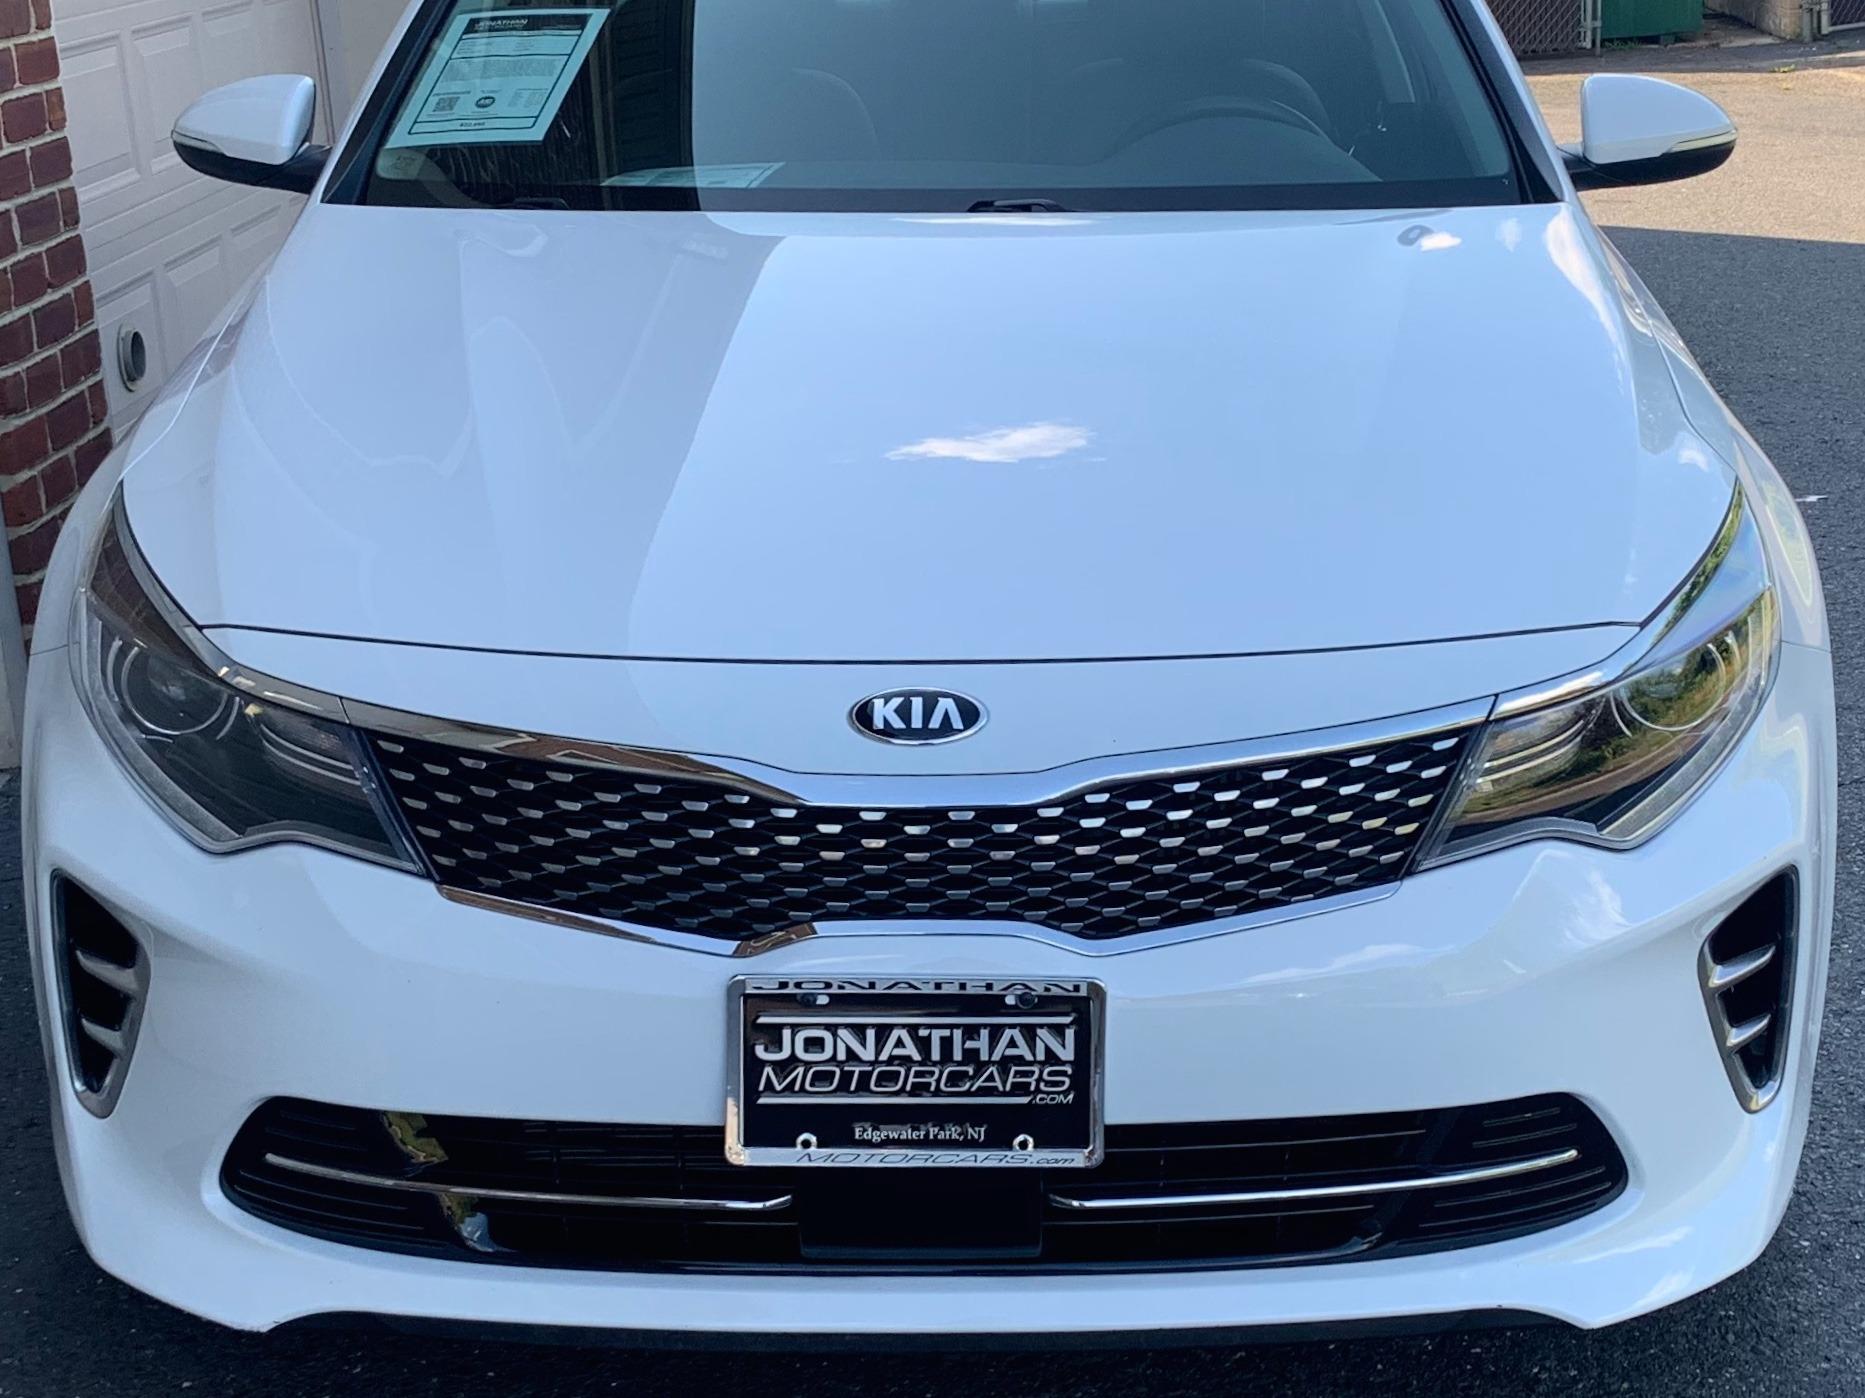 Used-2016-Kia-Optima-SX-Turbo-Technology-Package